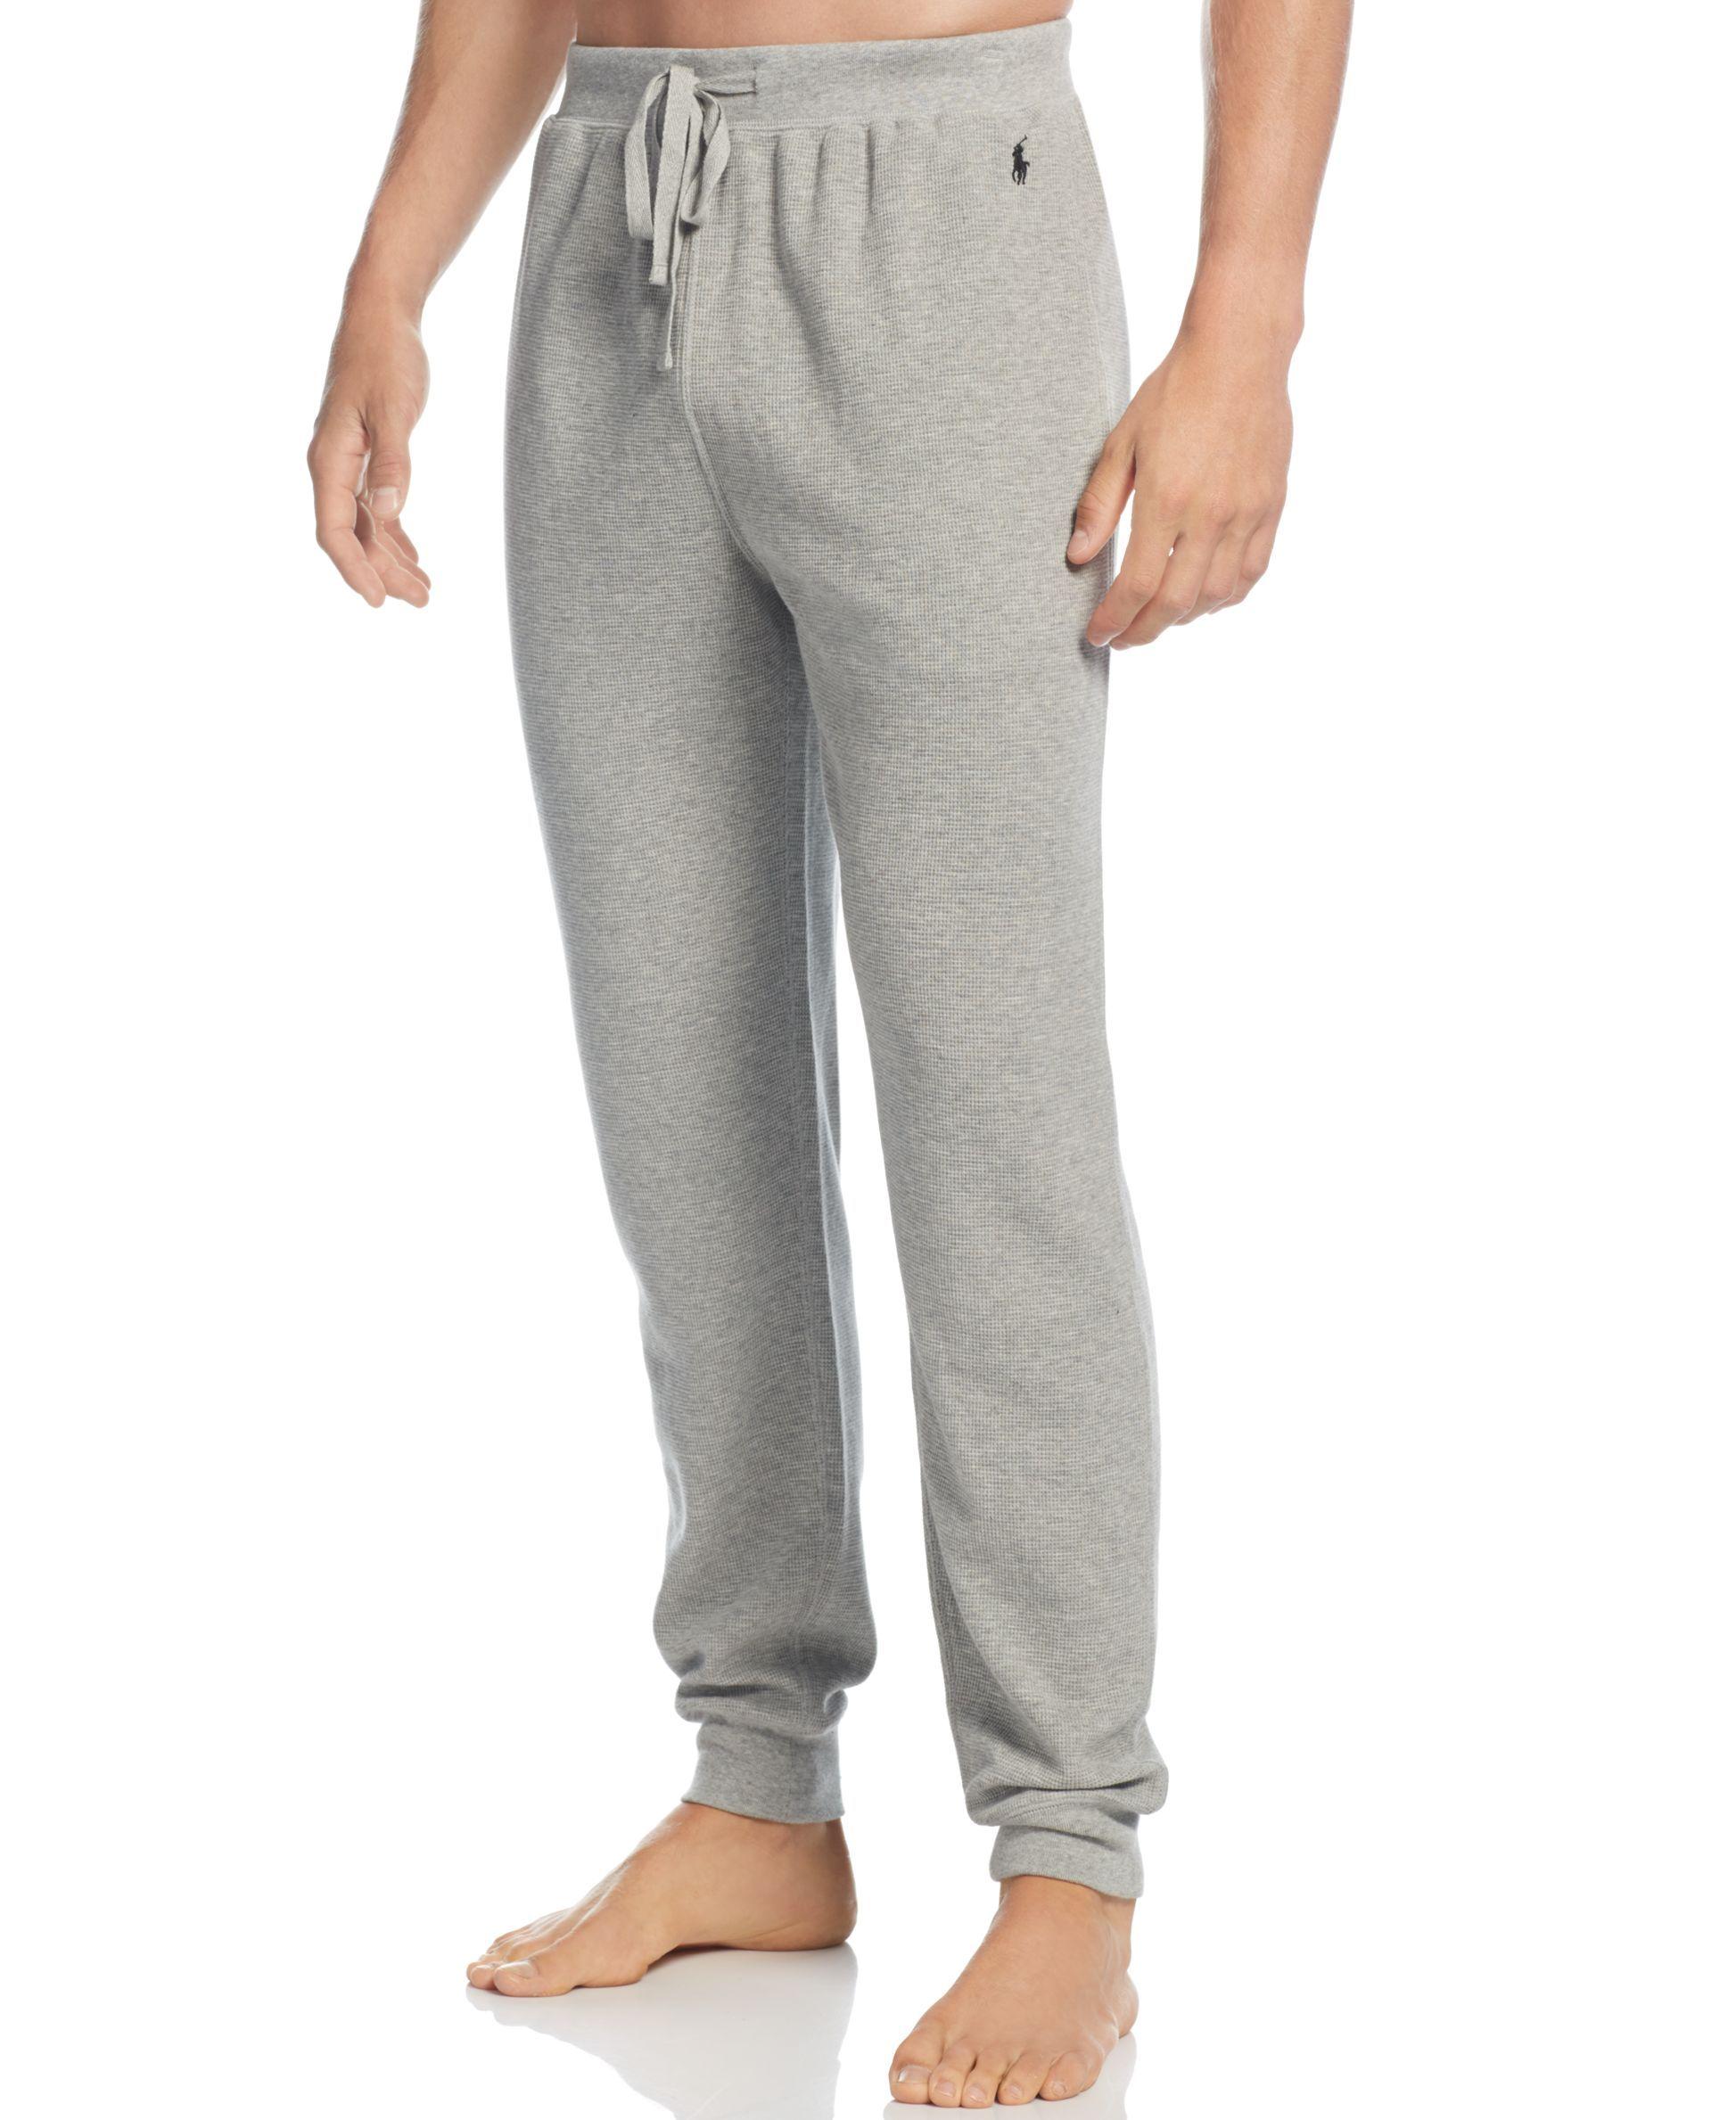 Polo Ralph Lauren Mens Loungewear Thermal Jogger Pants